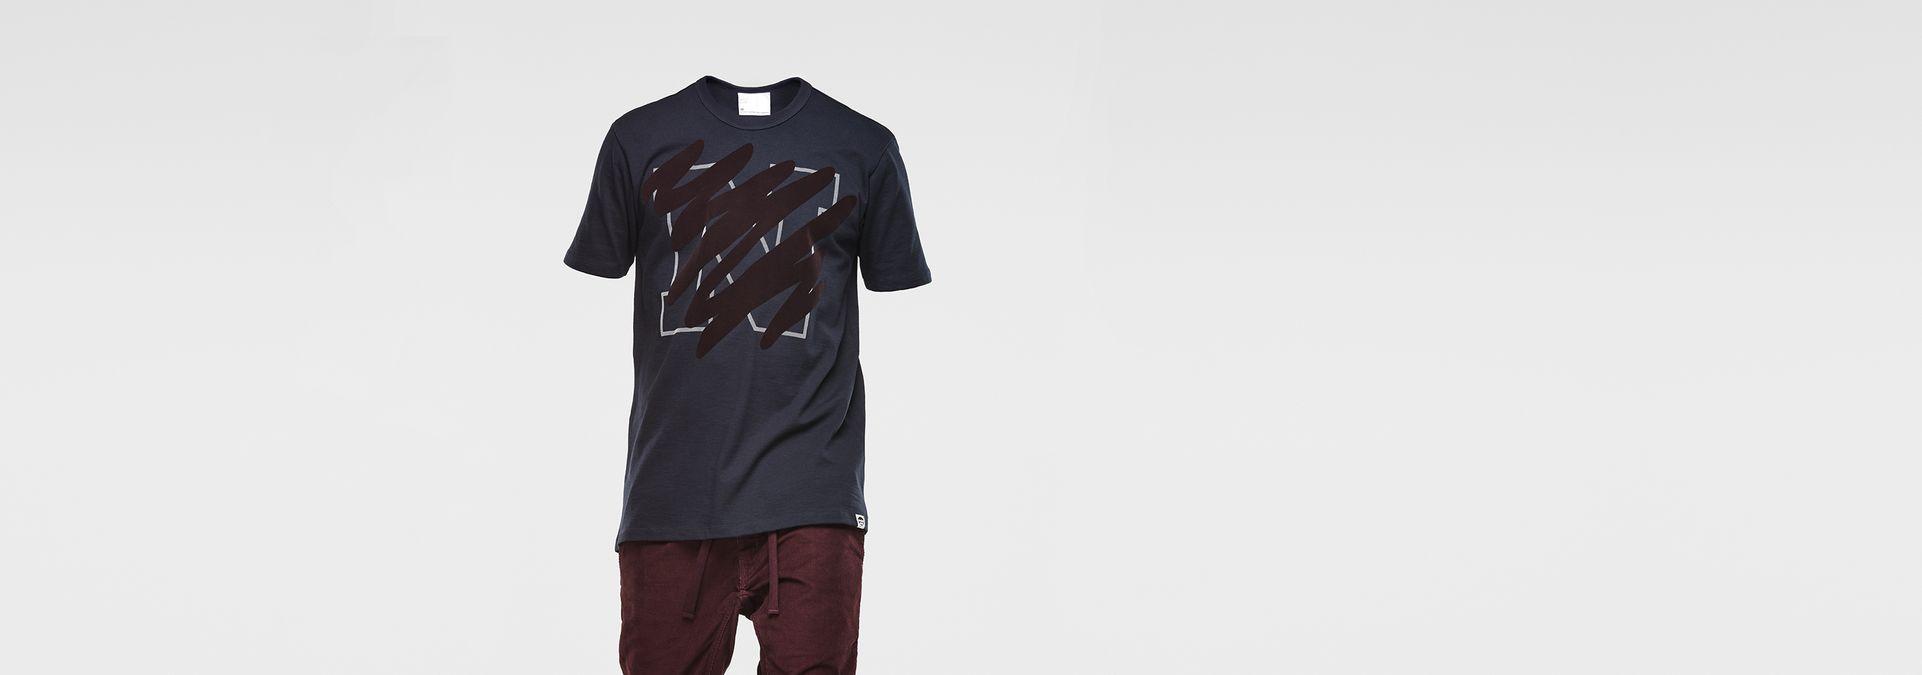 93206ac917 G-Star RAW® Marc Newson Scribble T-Shirt Dark blue ...